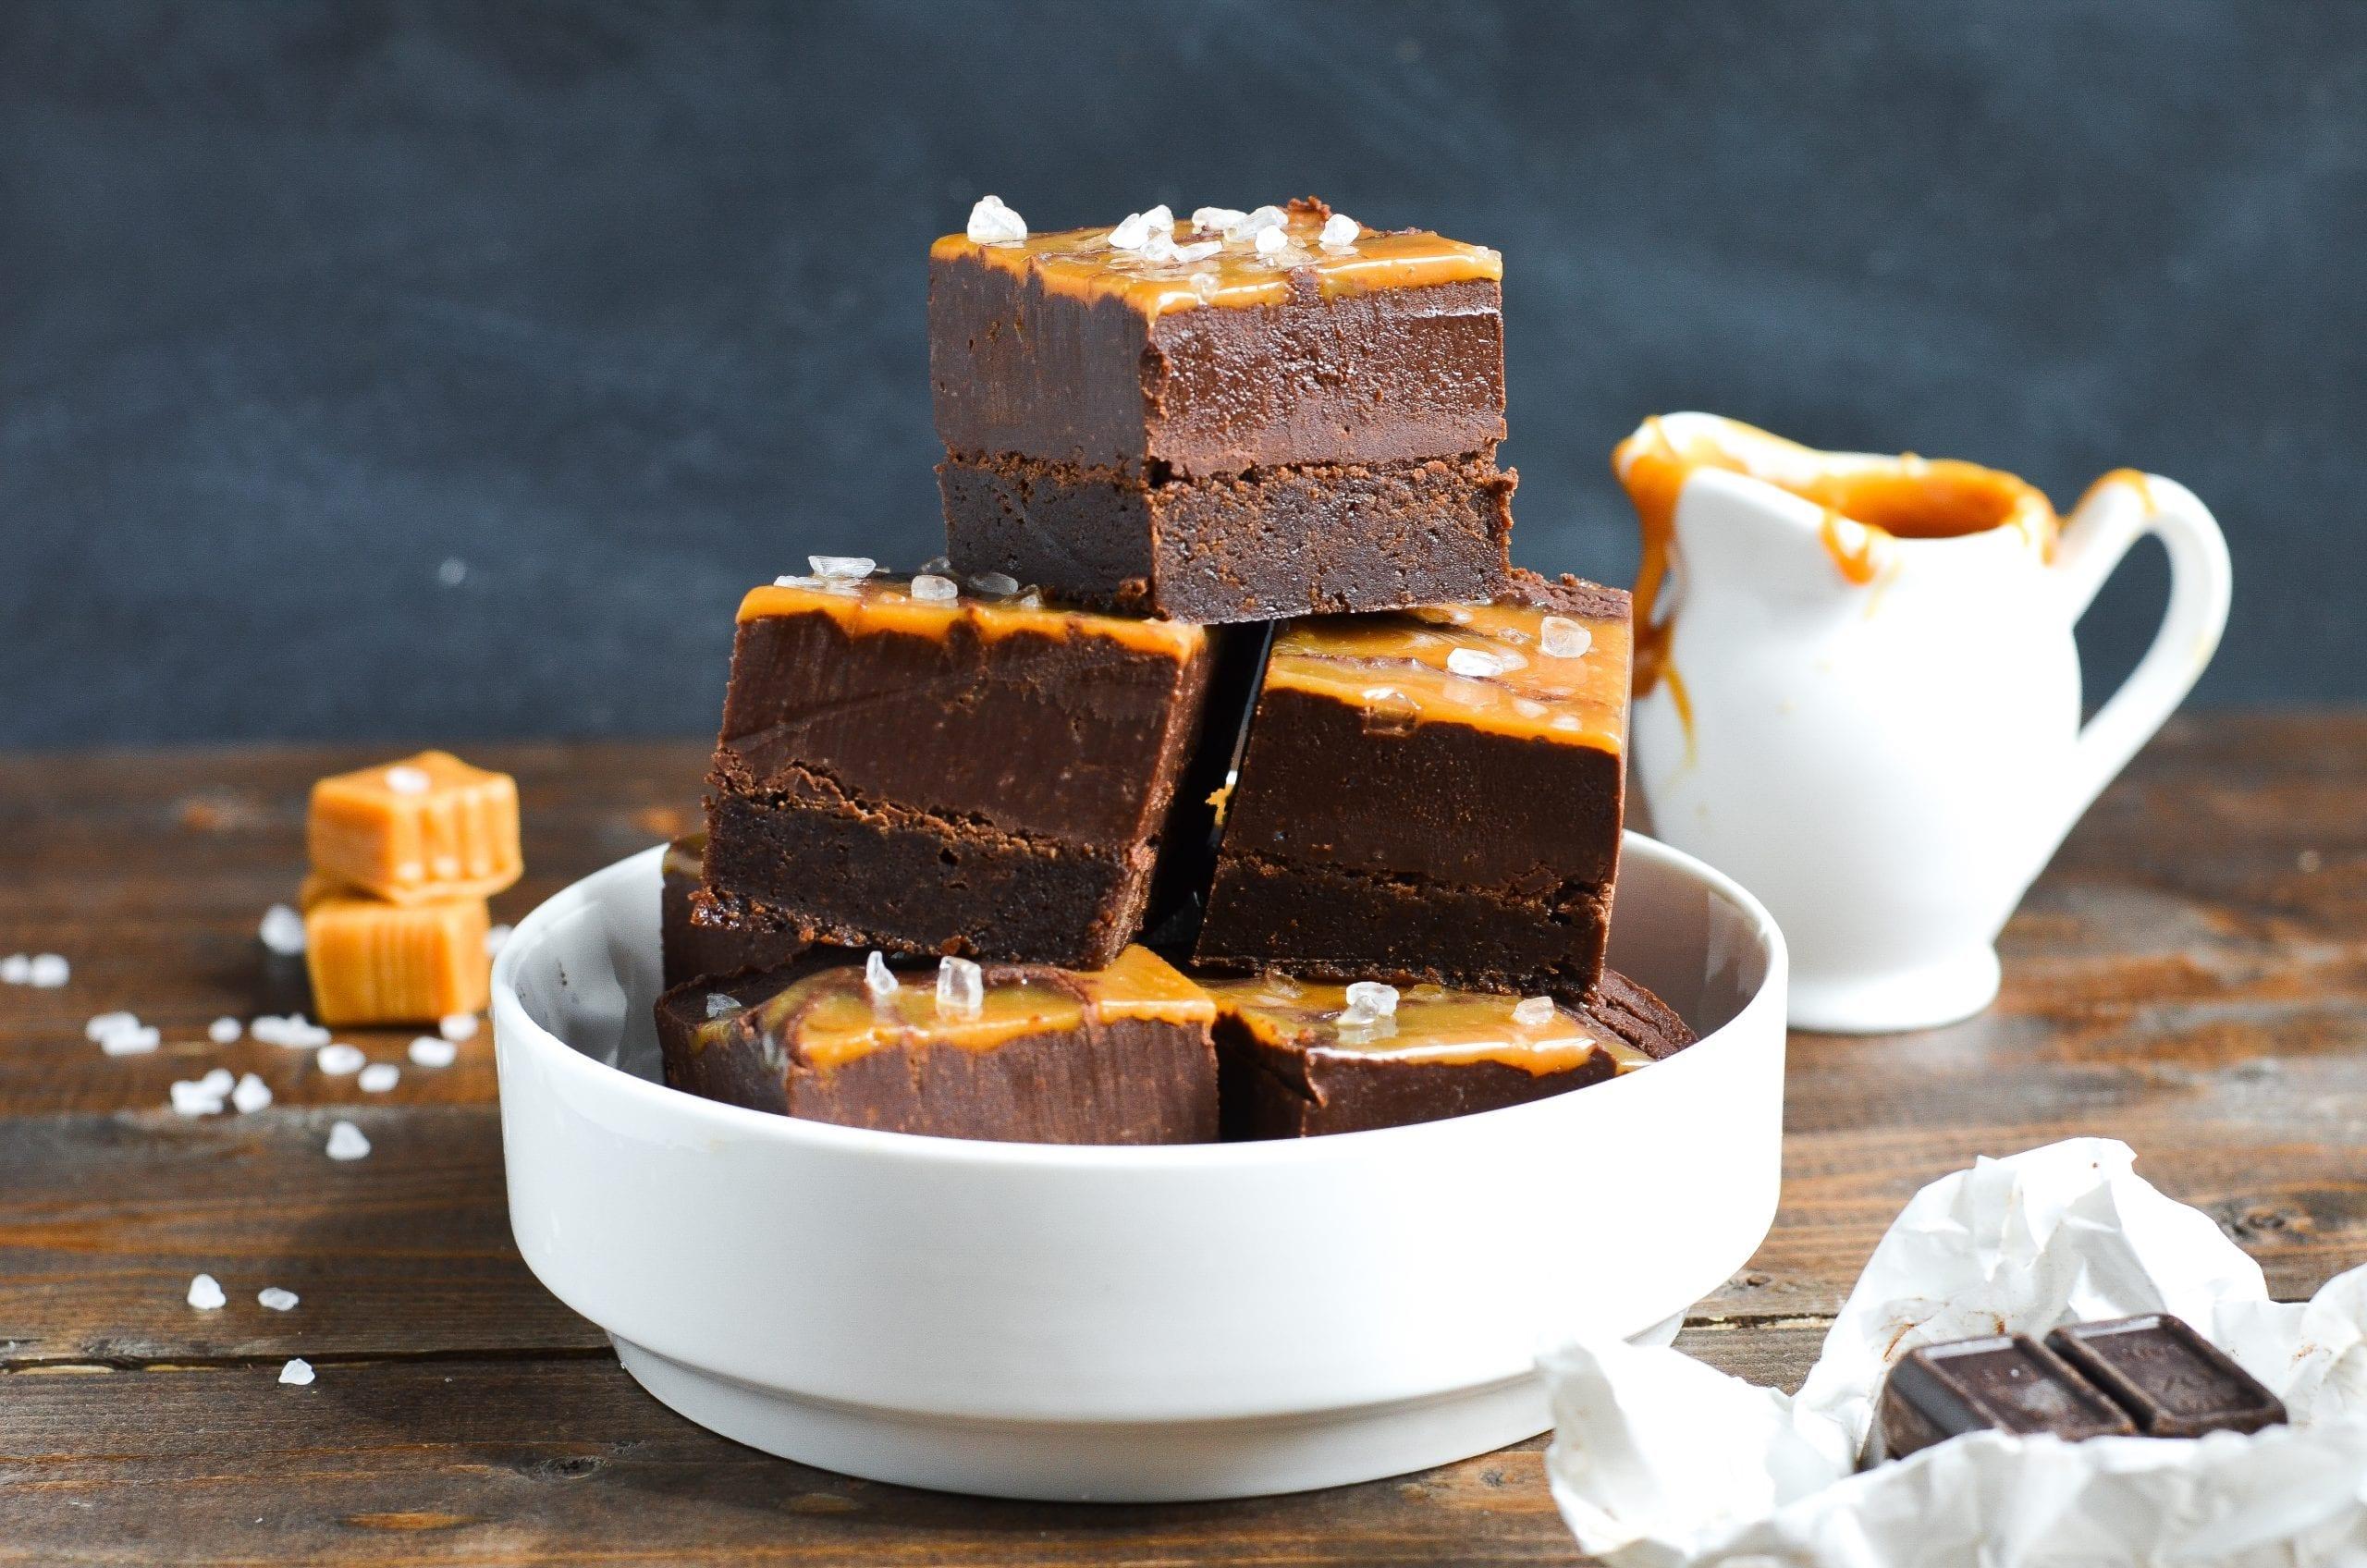 Chocolate Fudge Caramel Swirl Brownies